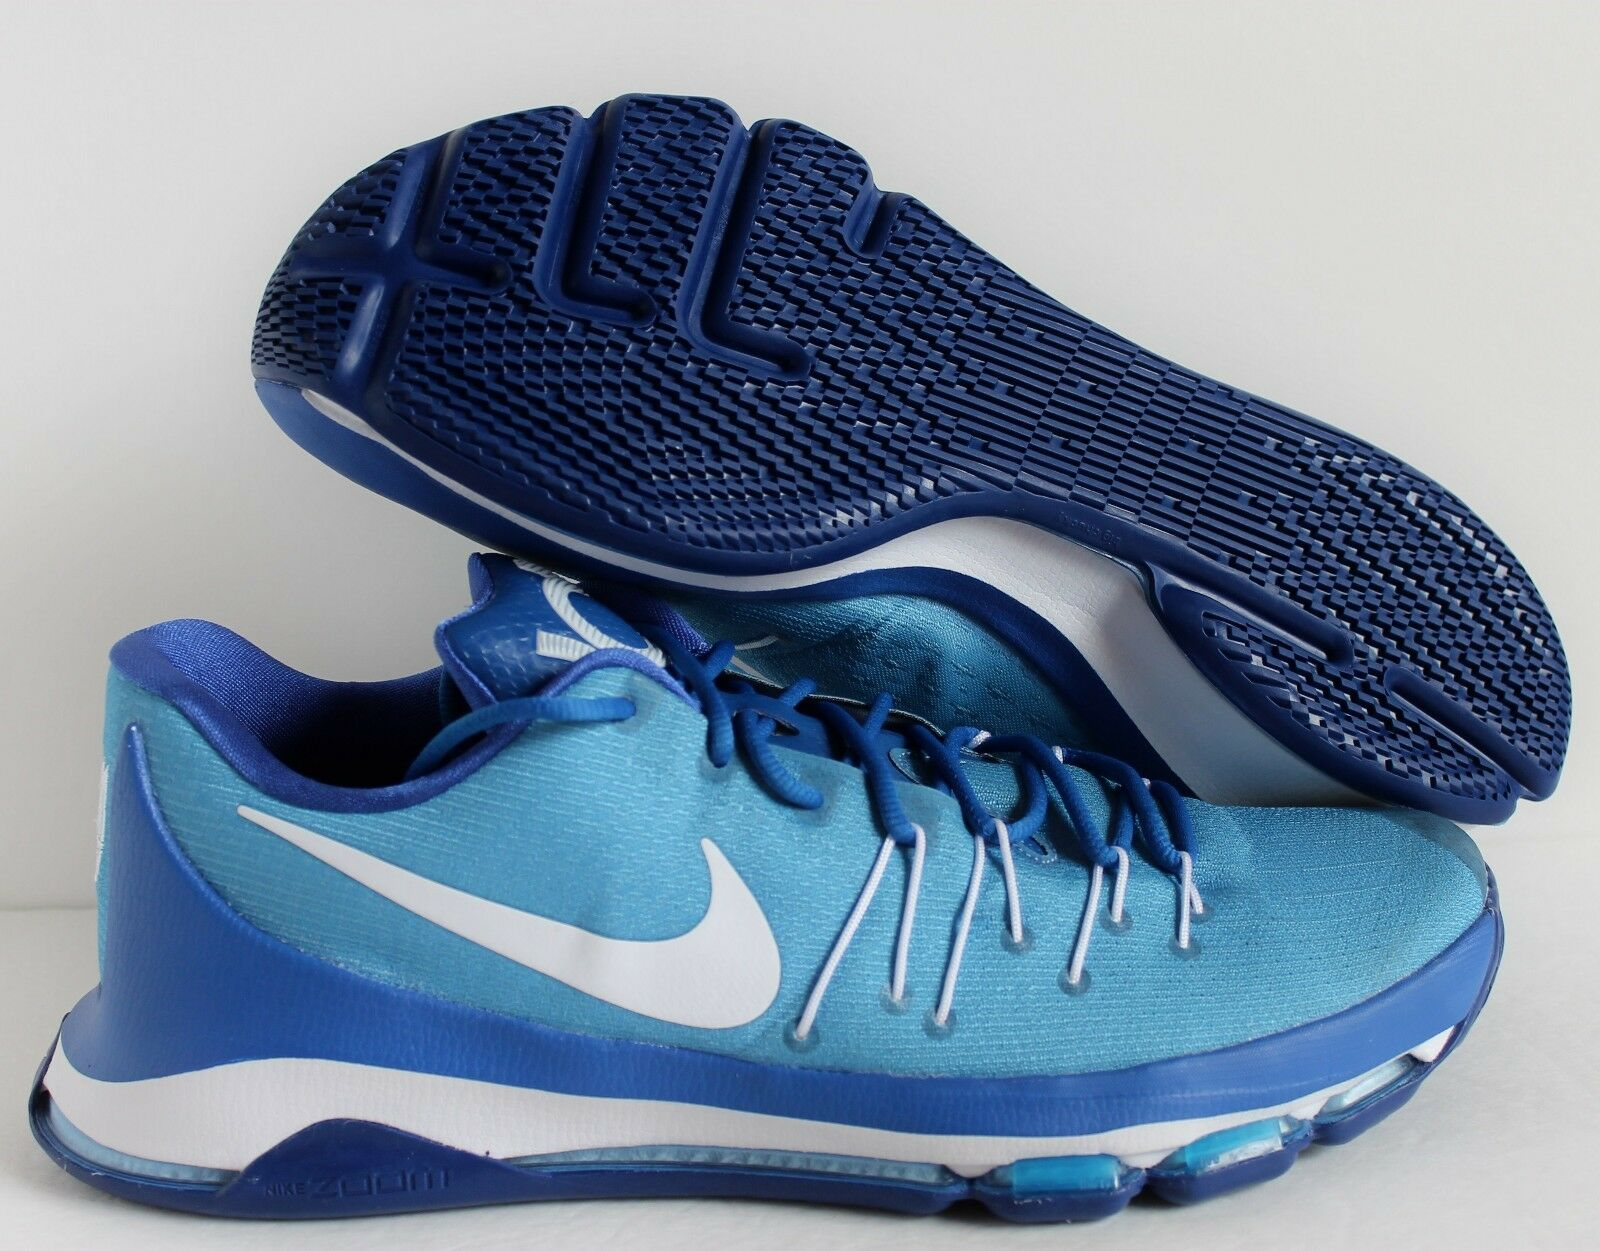 Nike Hombre KD 8 blanco VIII Kevin Durant Azul- blanco 8 o (818303-901) a42183